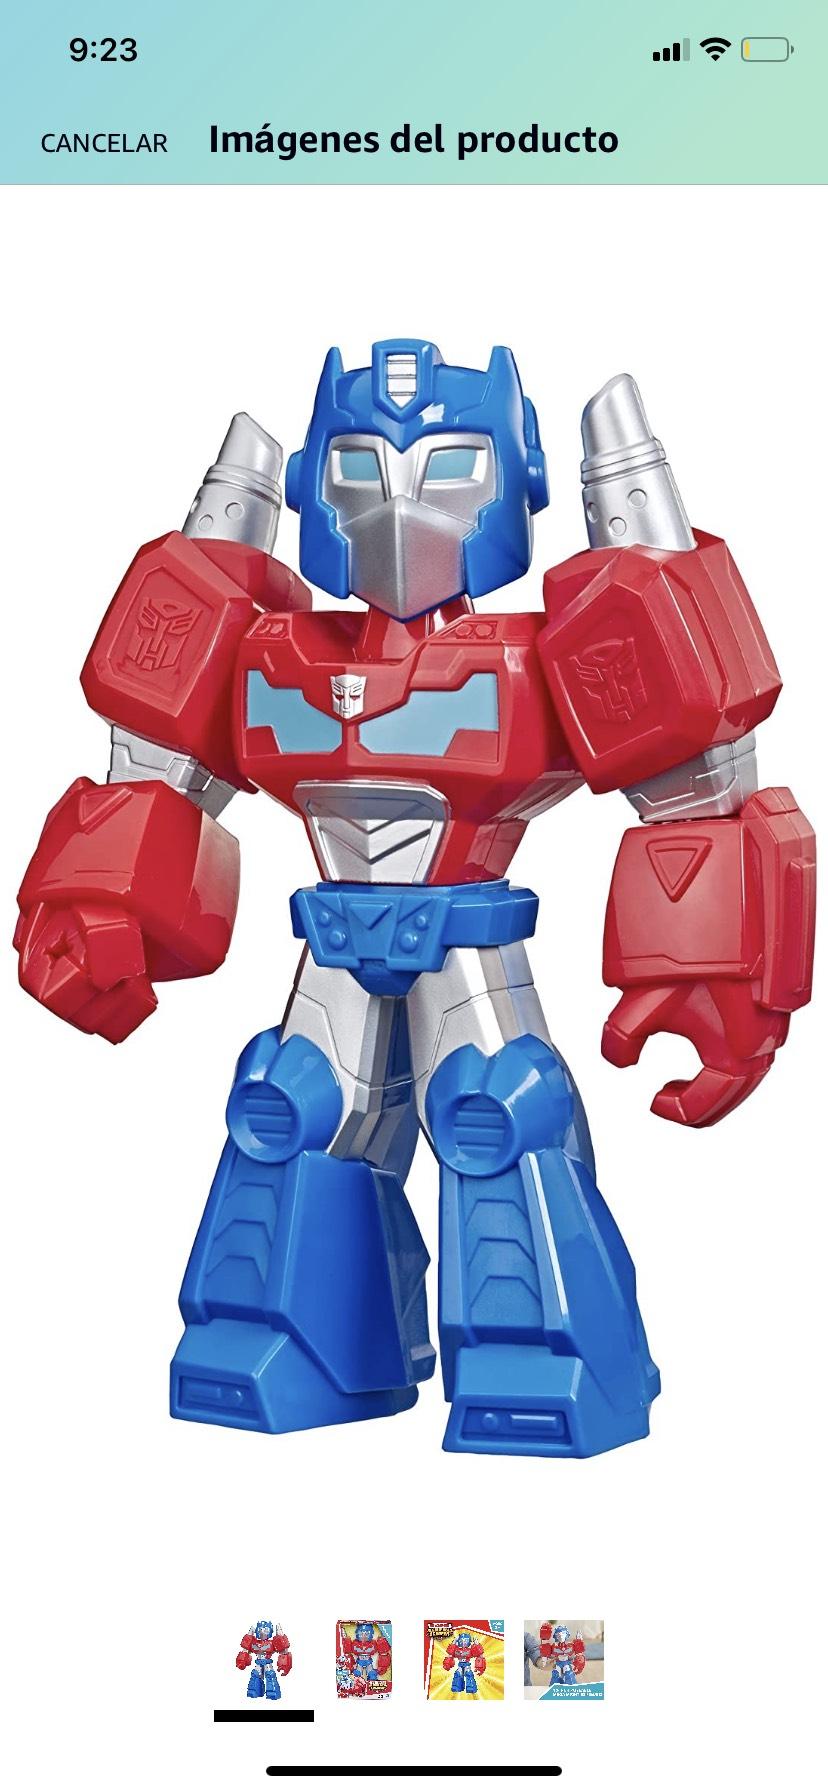 Amazon: Playskool Heroes Transformers Robot Mega Optimus Prime